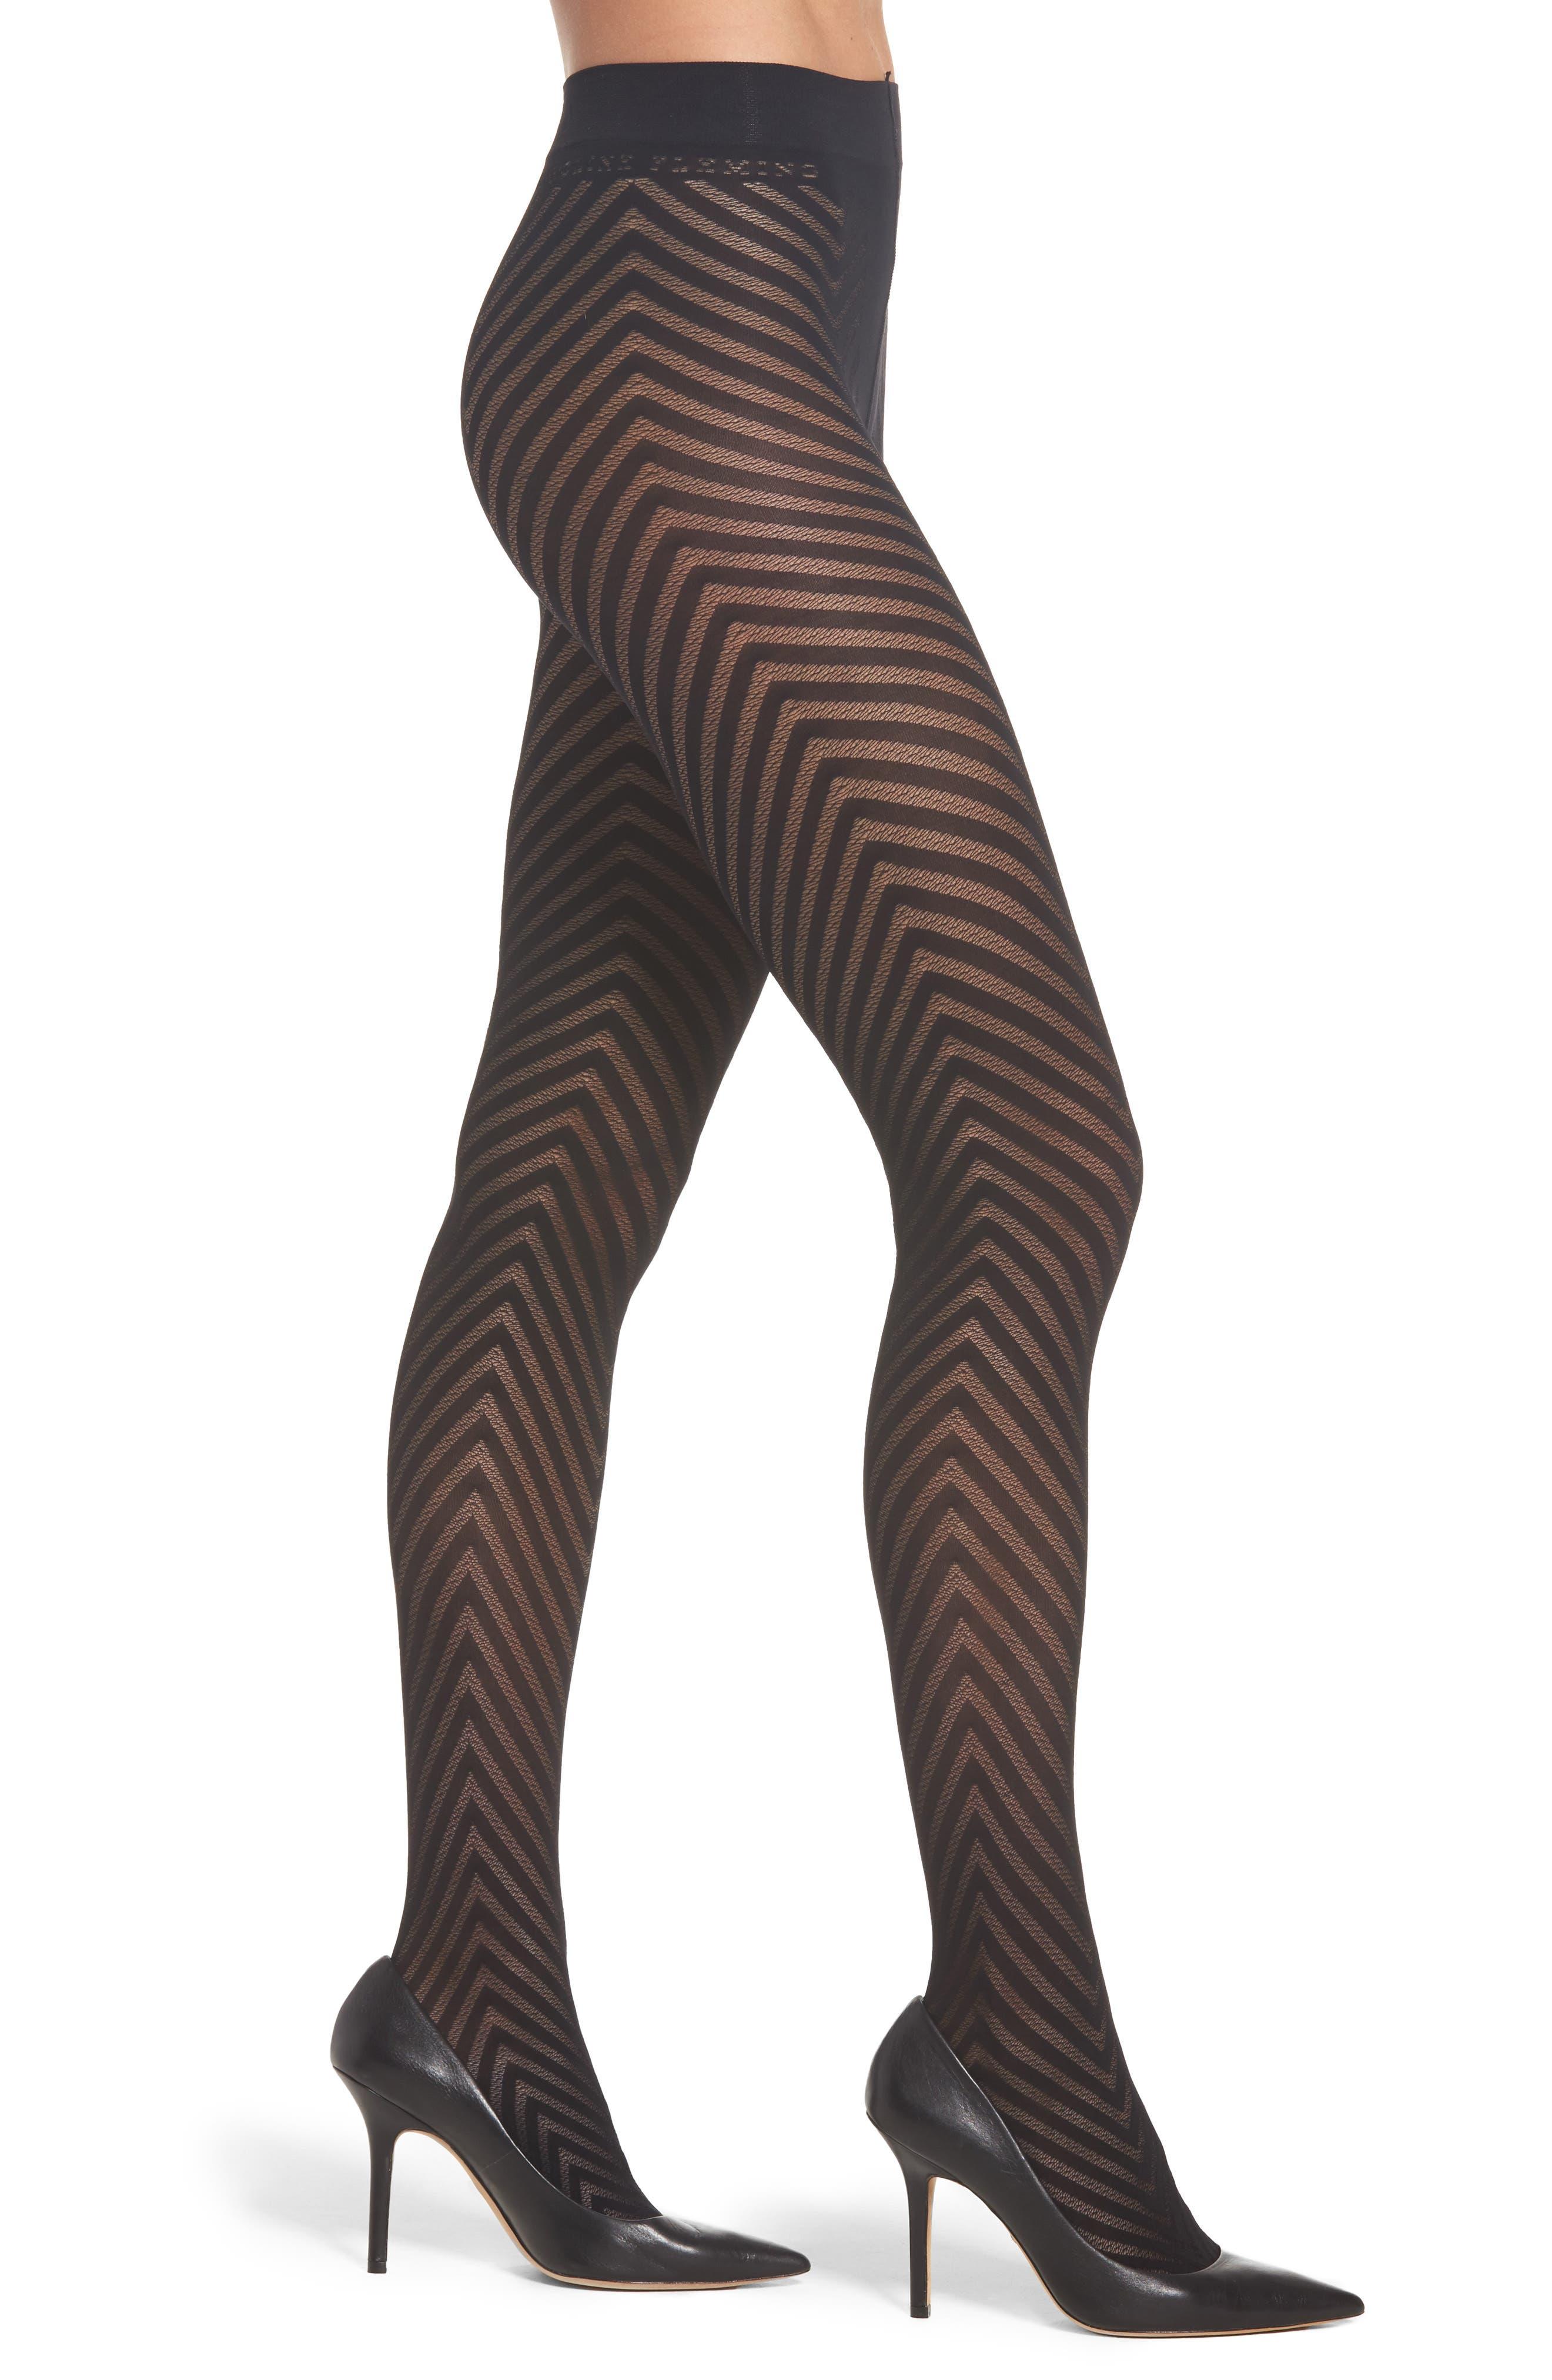 Main Image - Beautiful Legs by Caroline Fleming Chevron Pantyhose